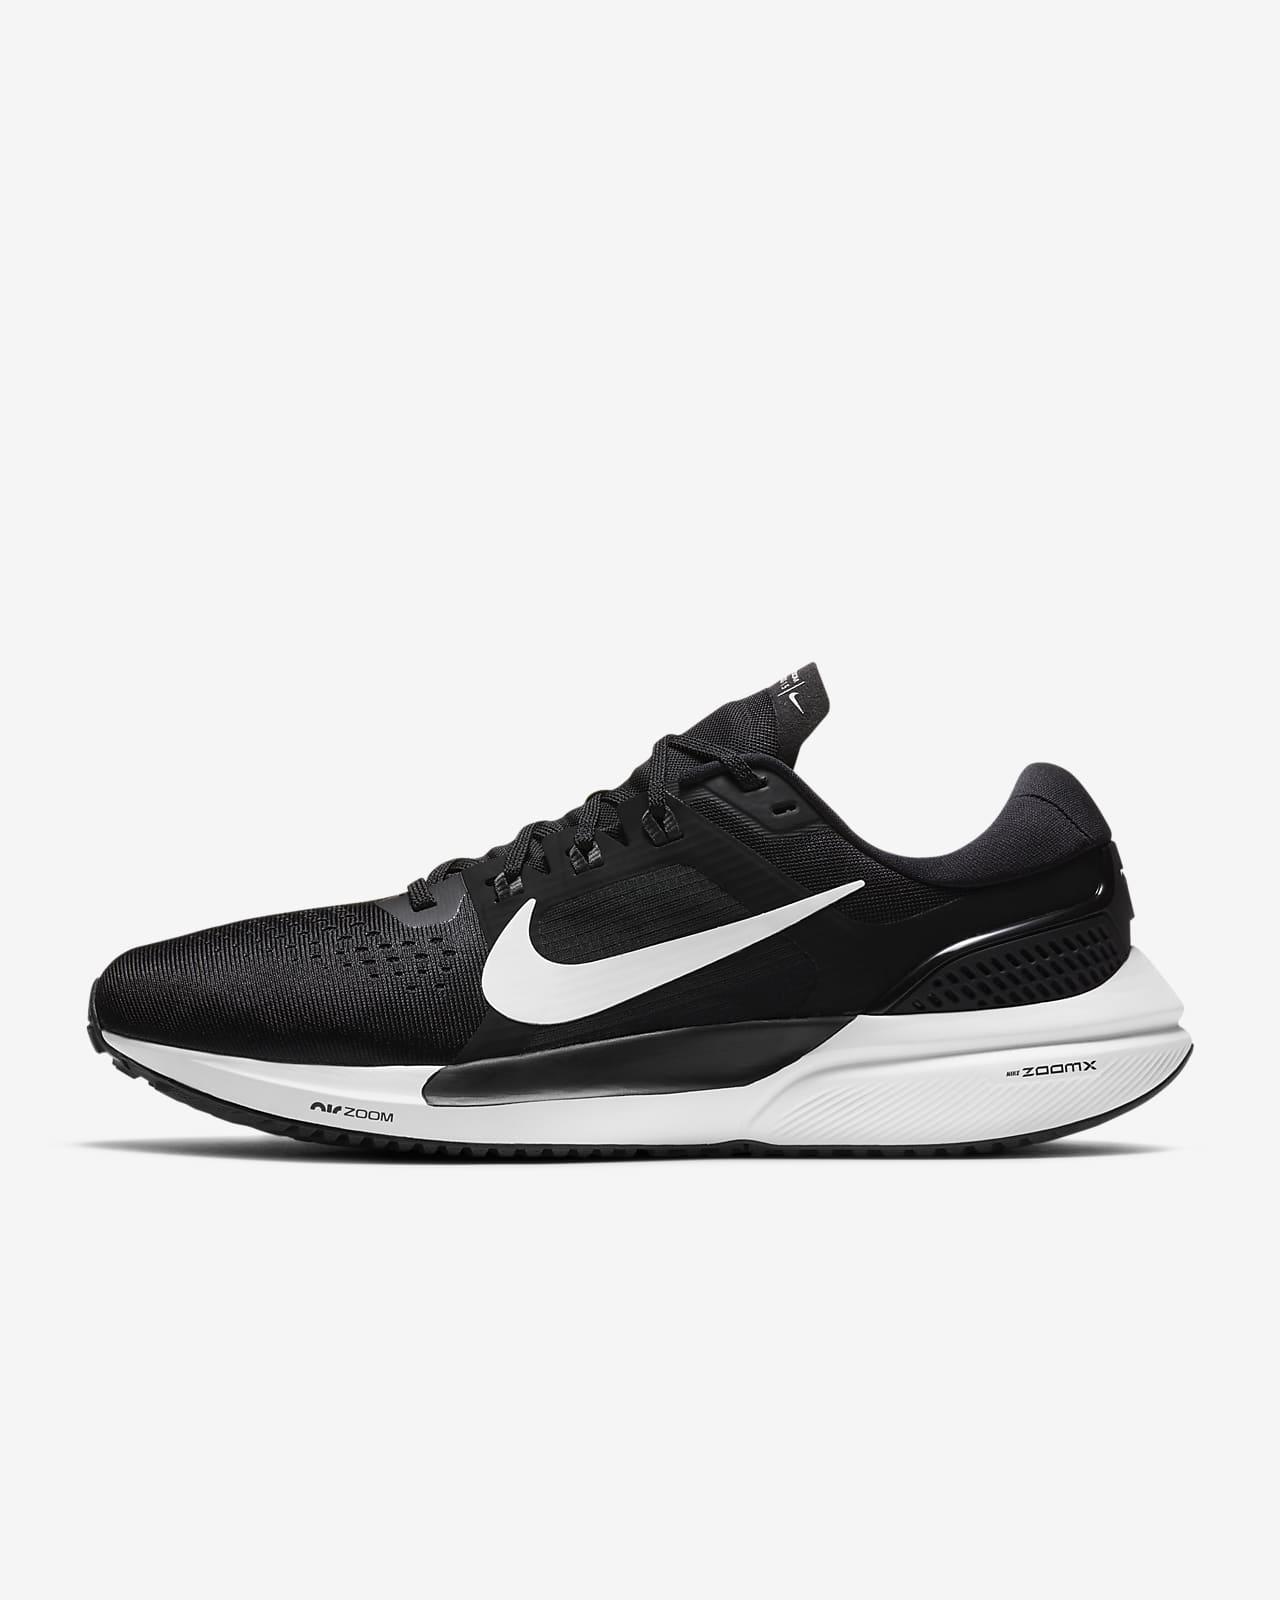 Nike Air Zoom Vomero 15 男款跑鞋